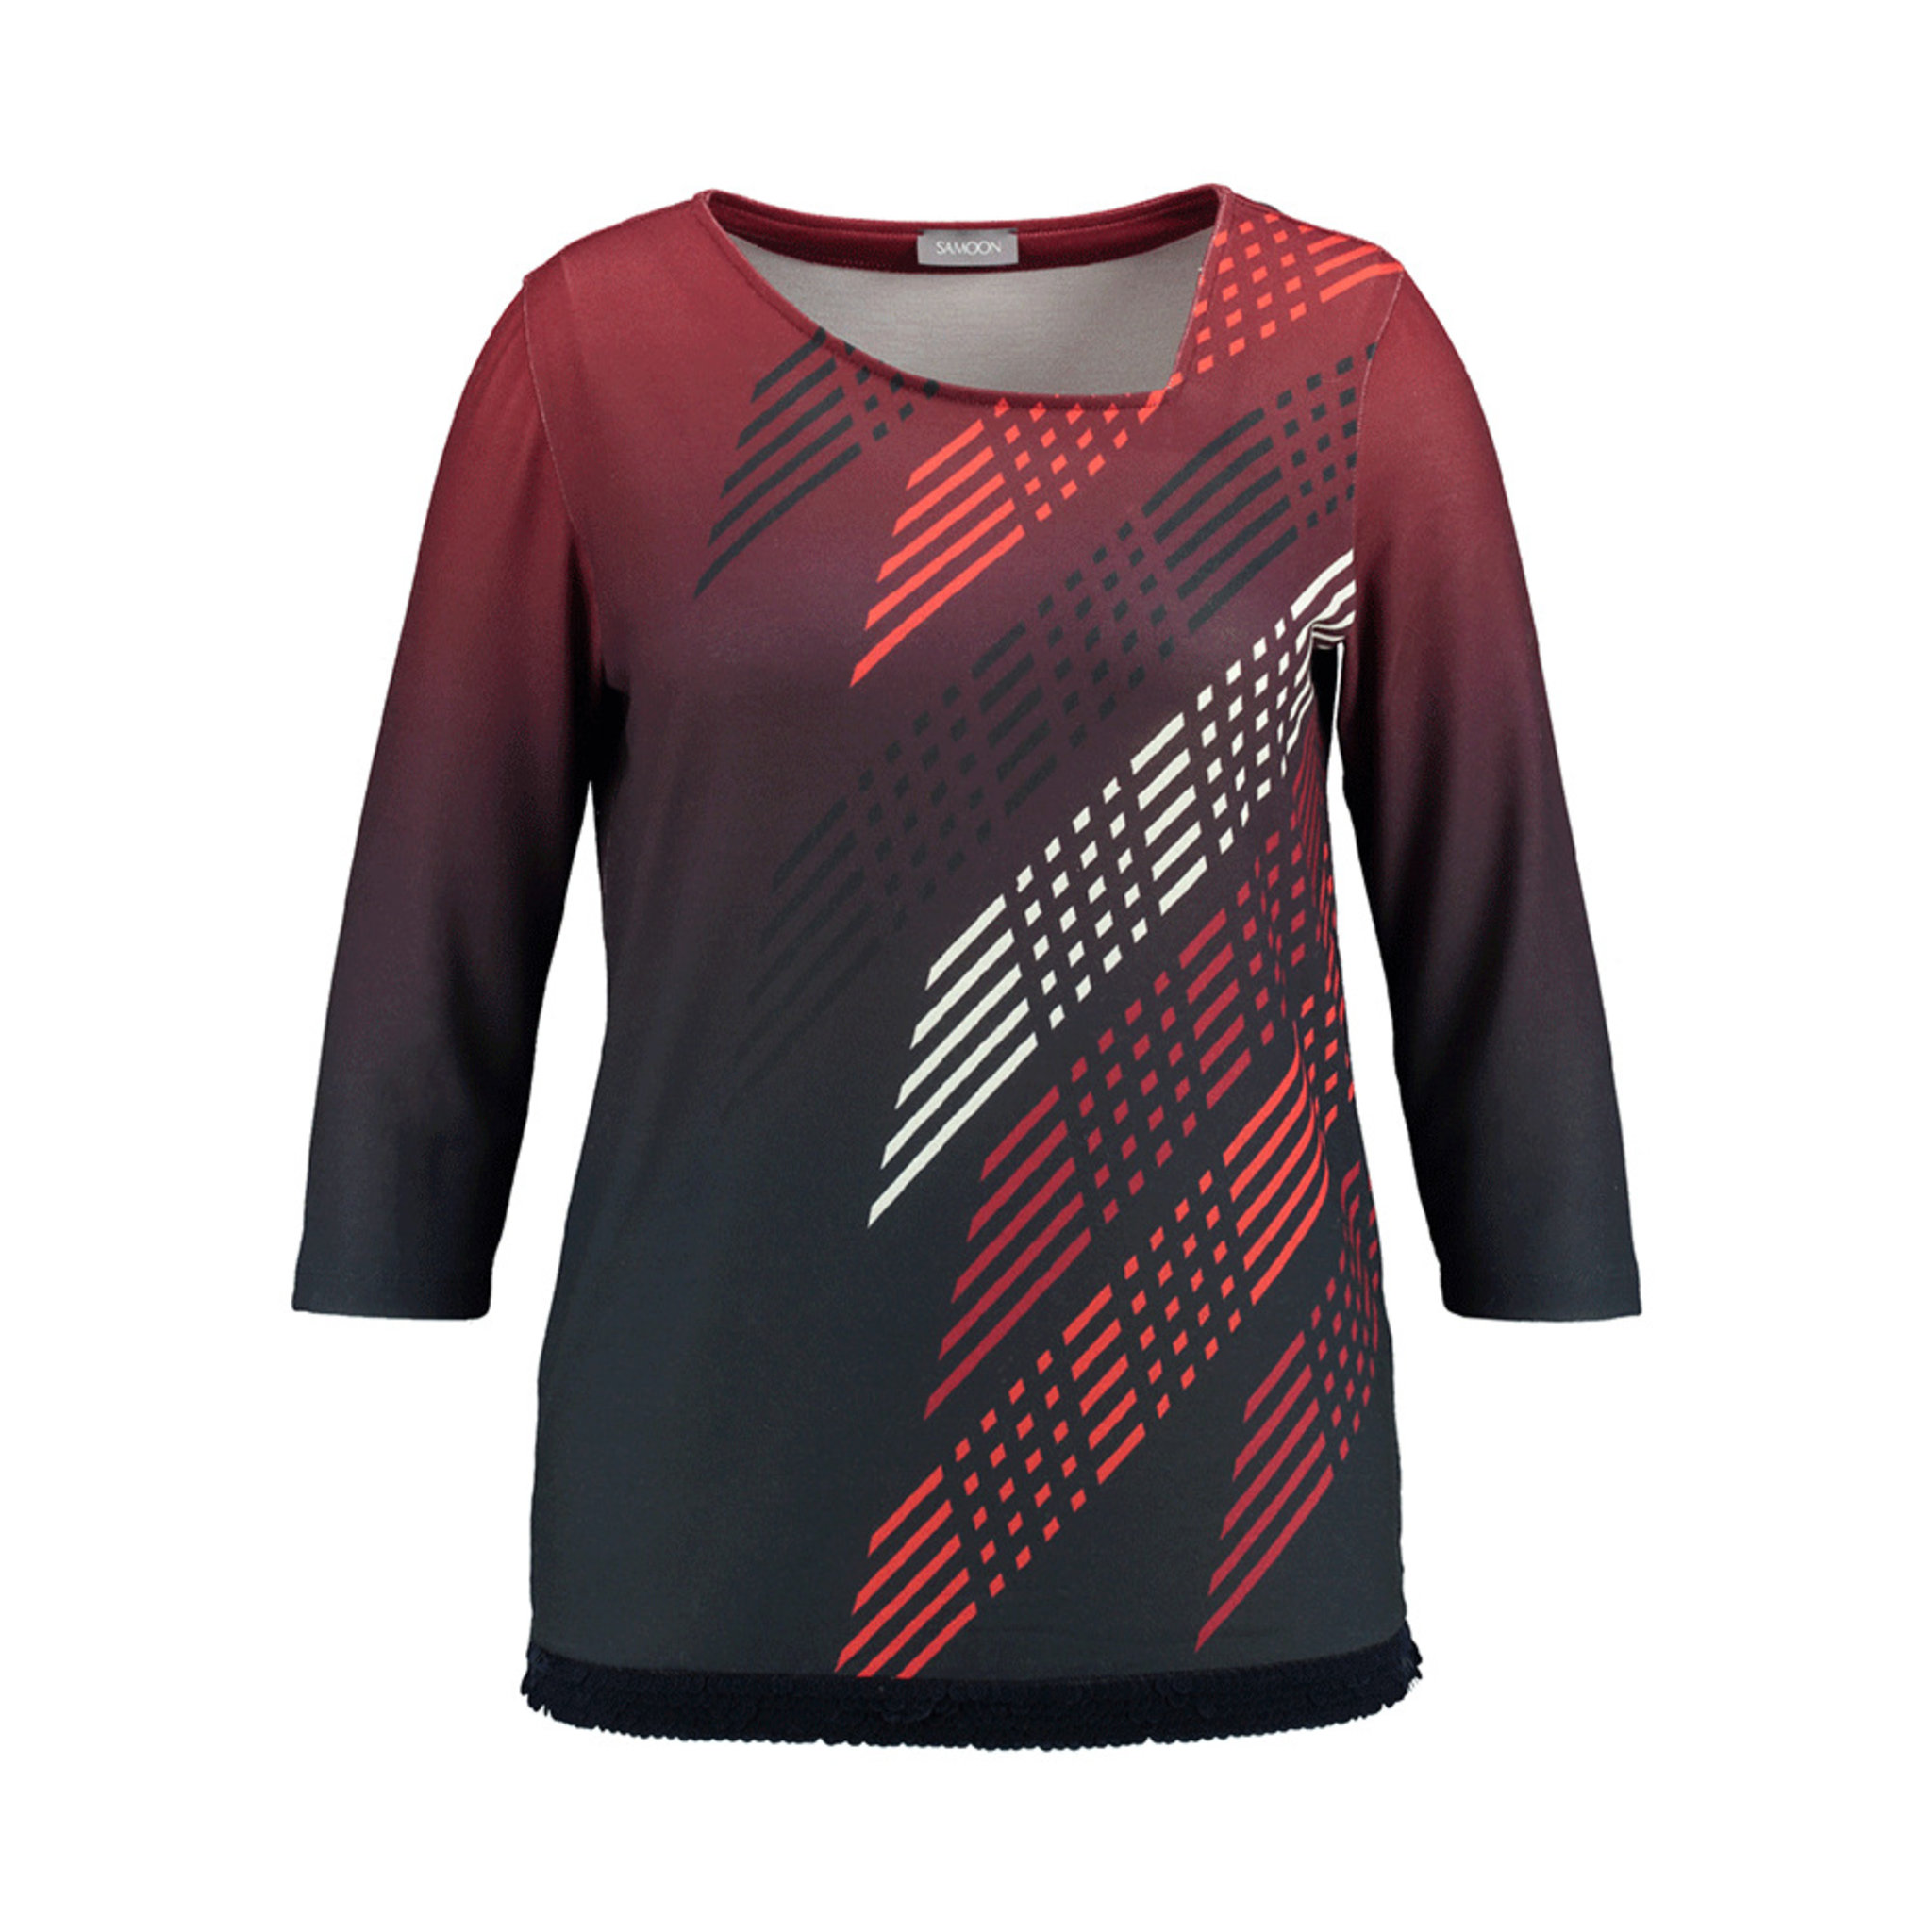 4d33fa7a T-shirt med 3/4 lång ärm - T-shirts & toppar - Köp online på åhlens.se!